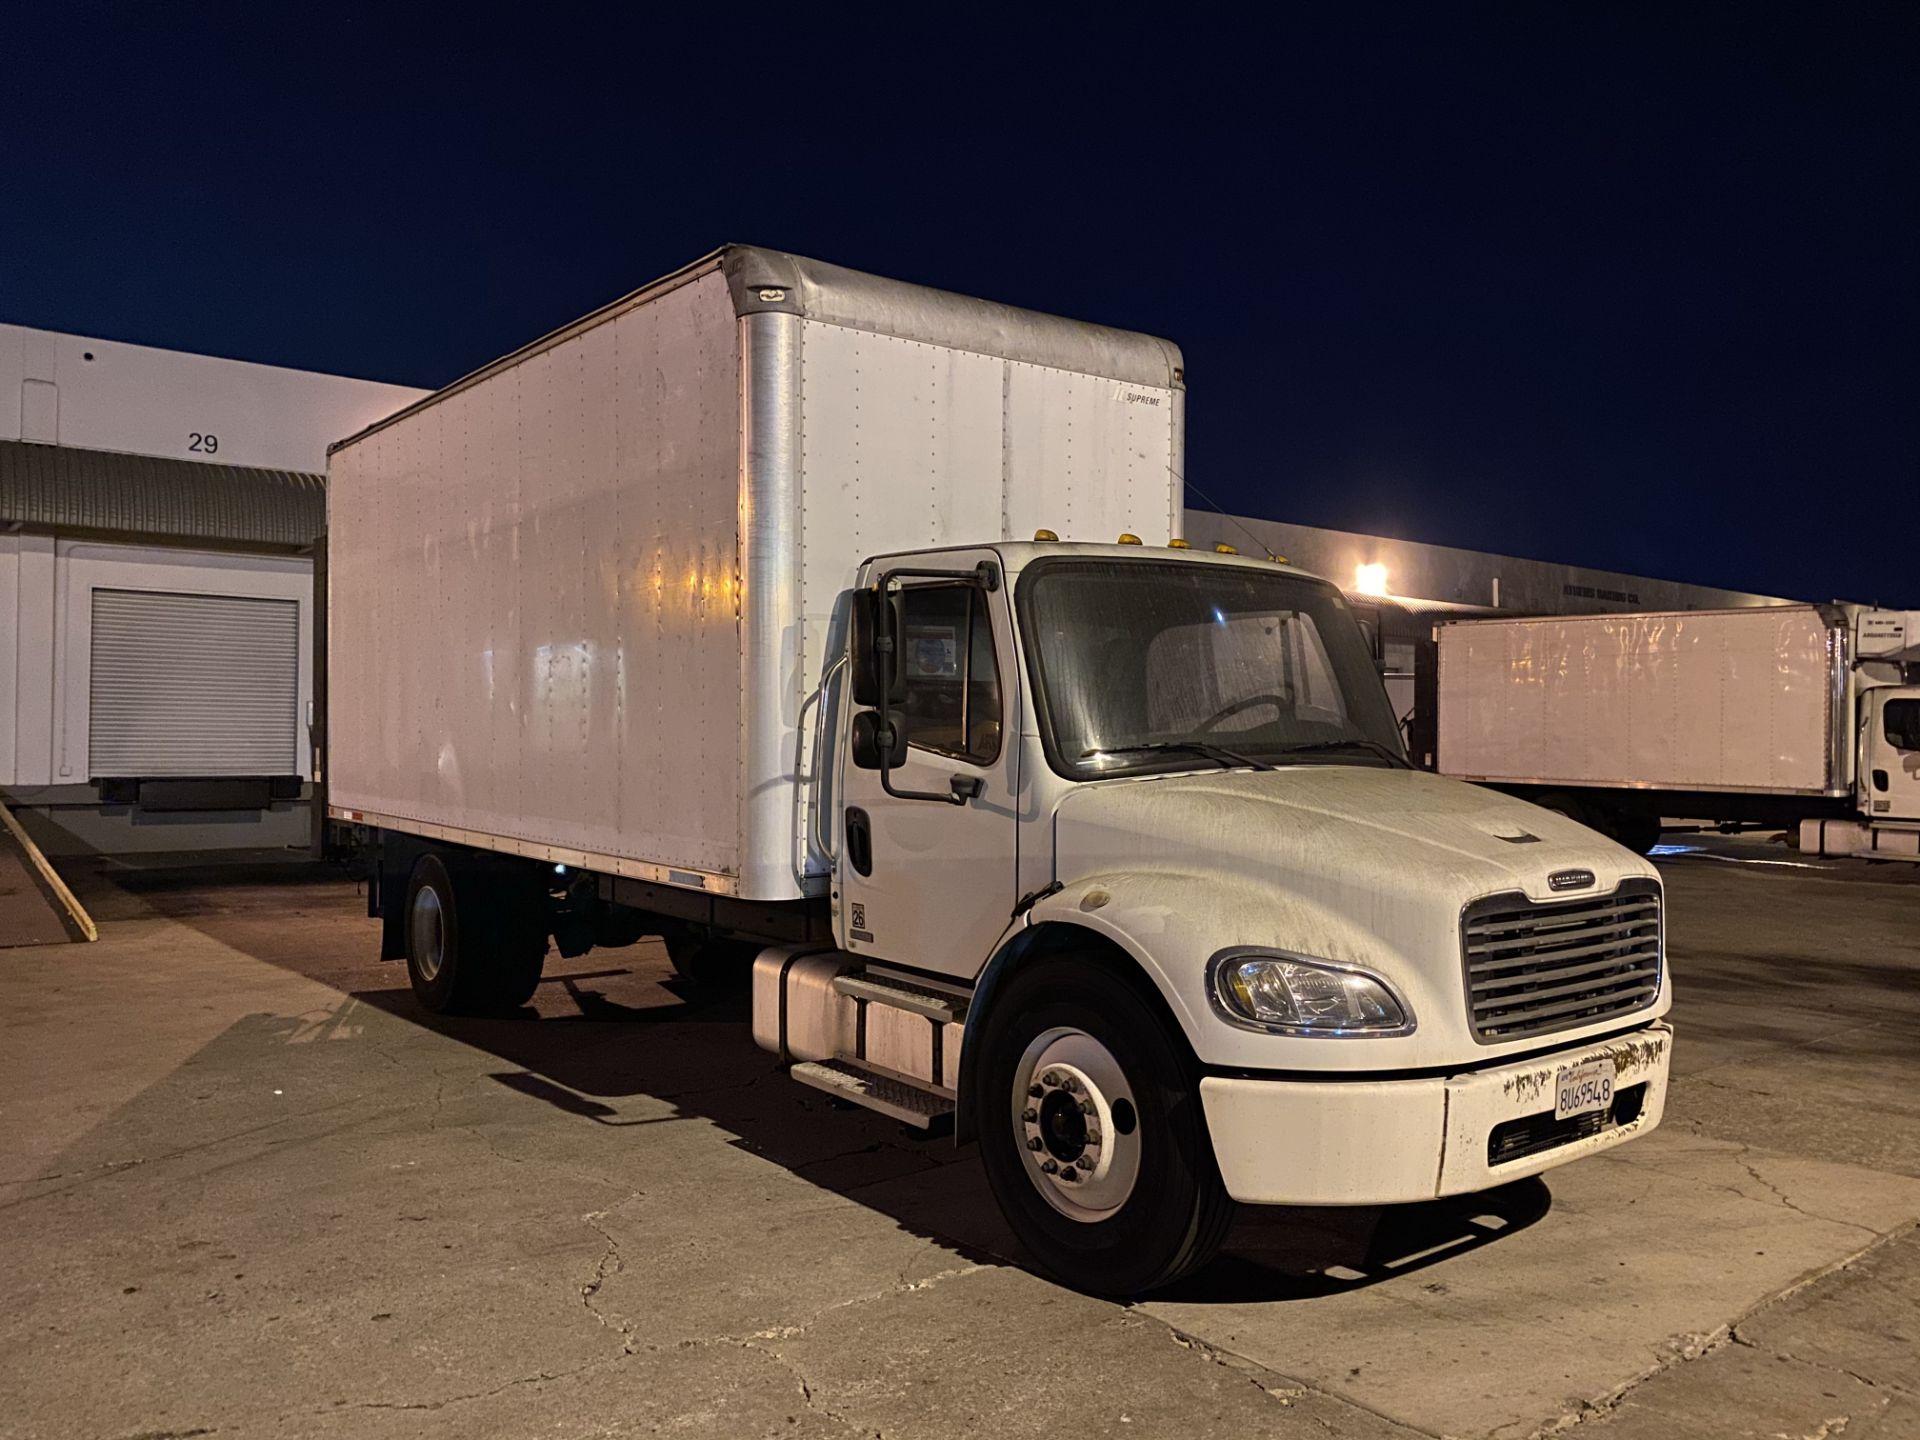 2005 Freightliner dry van truck - Image 4 of 5